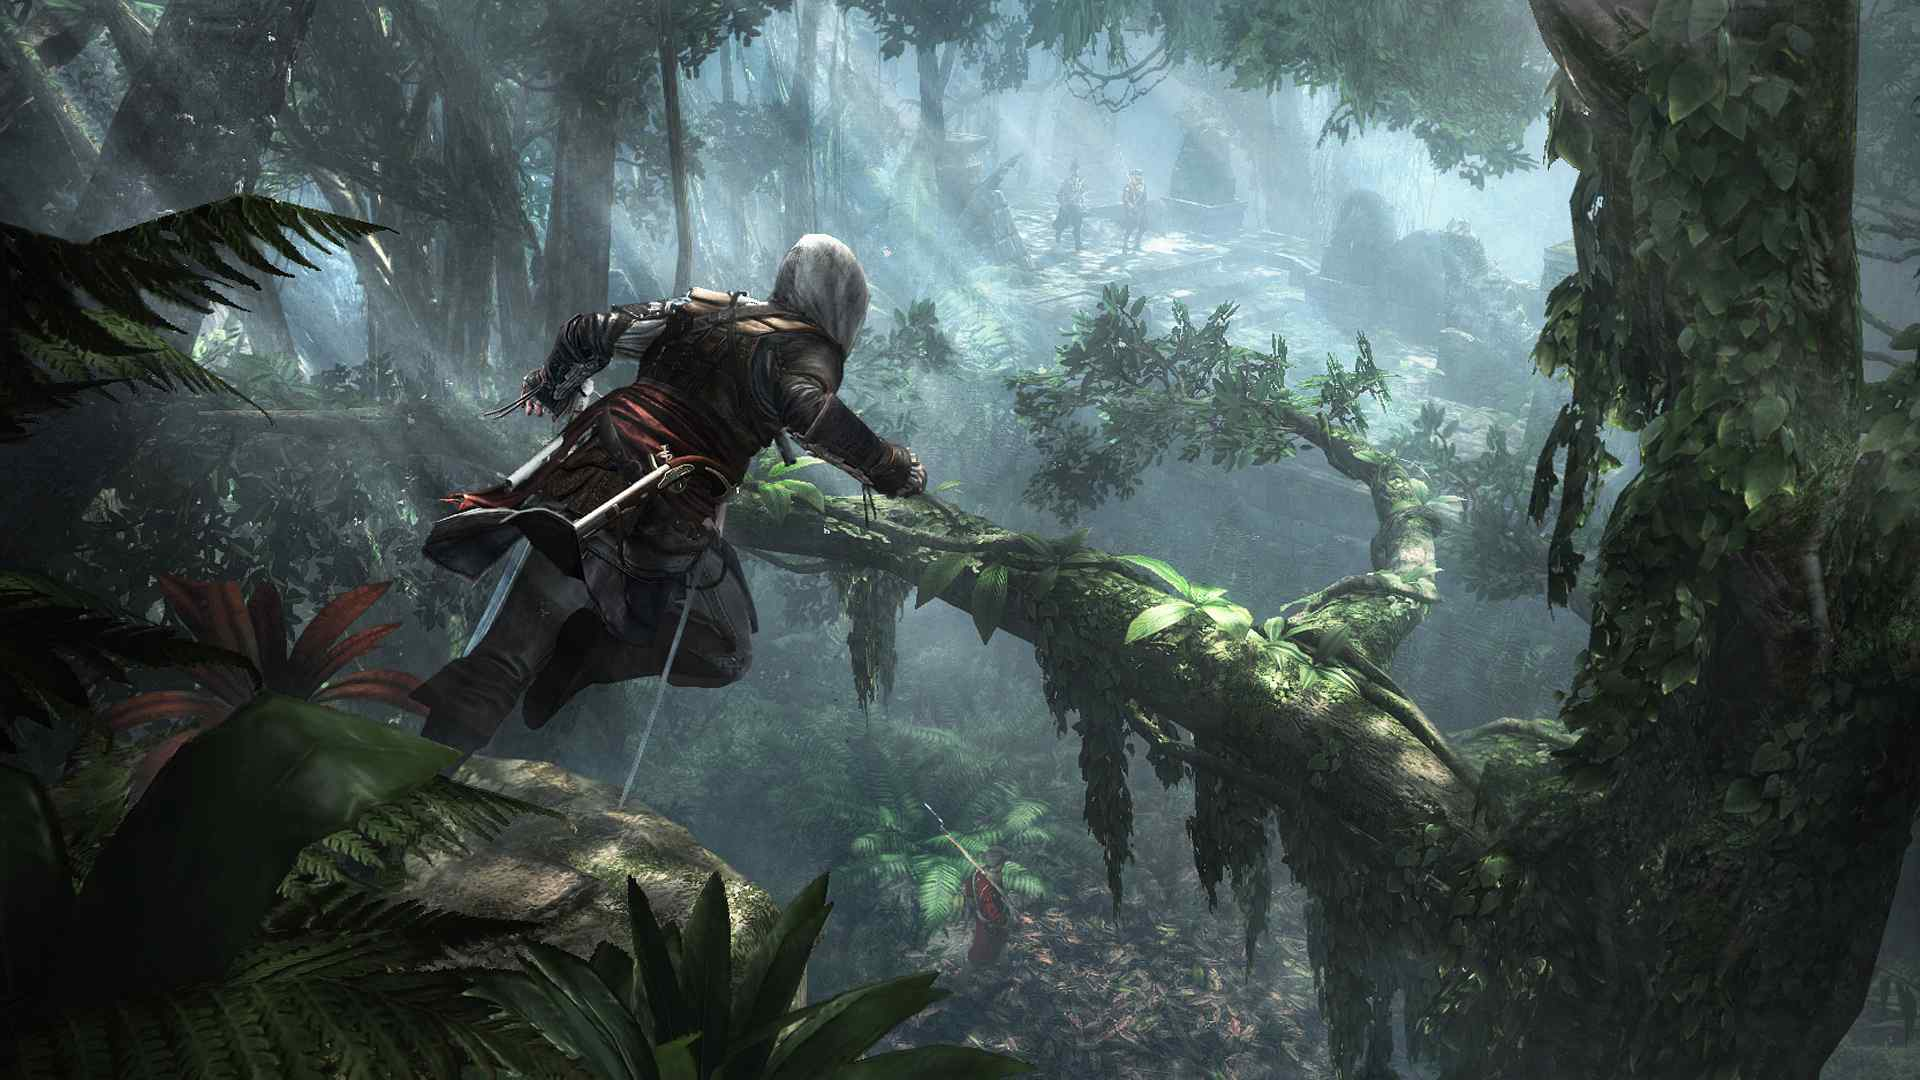 Assassin's Creed IV: Black Flag Screenshot 1